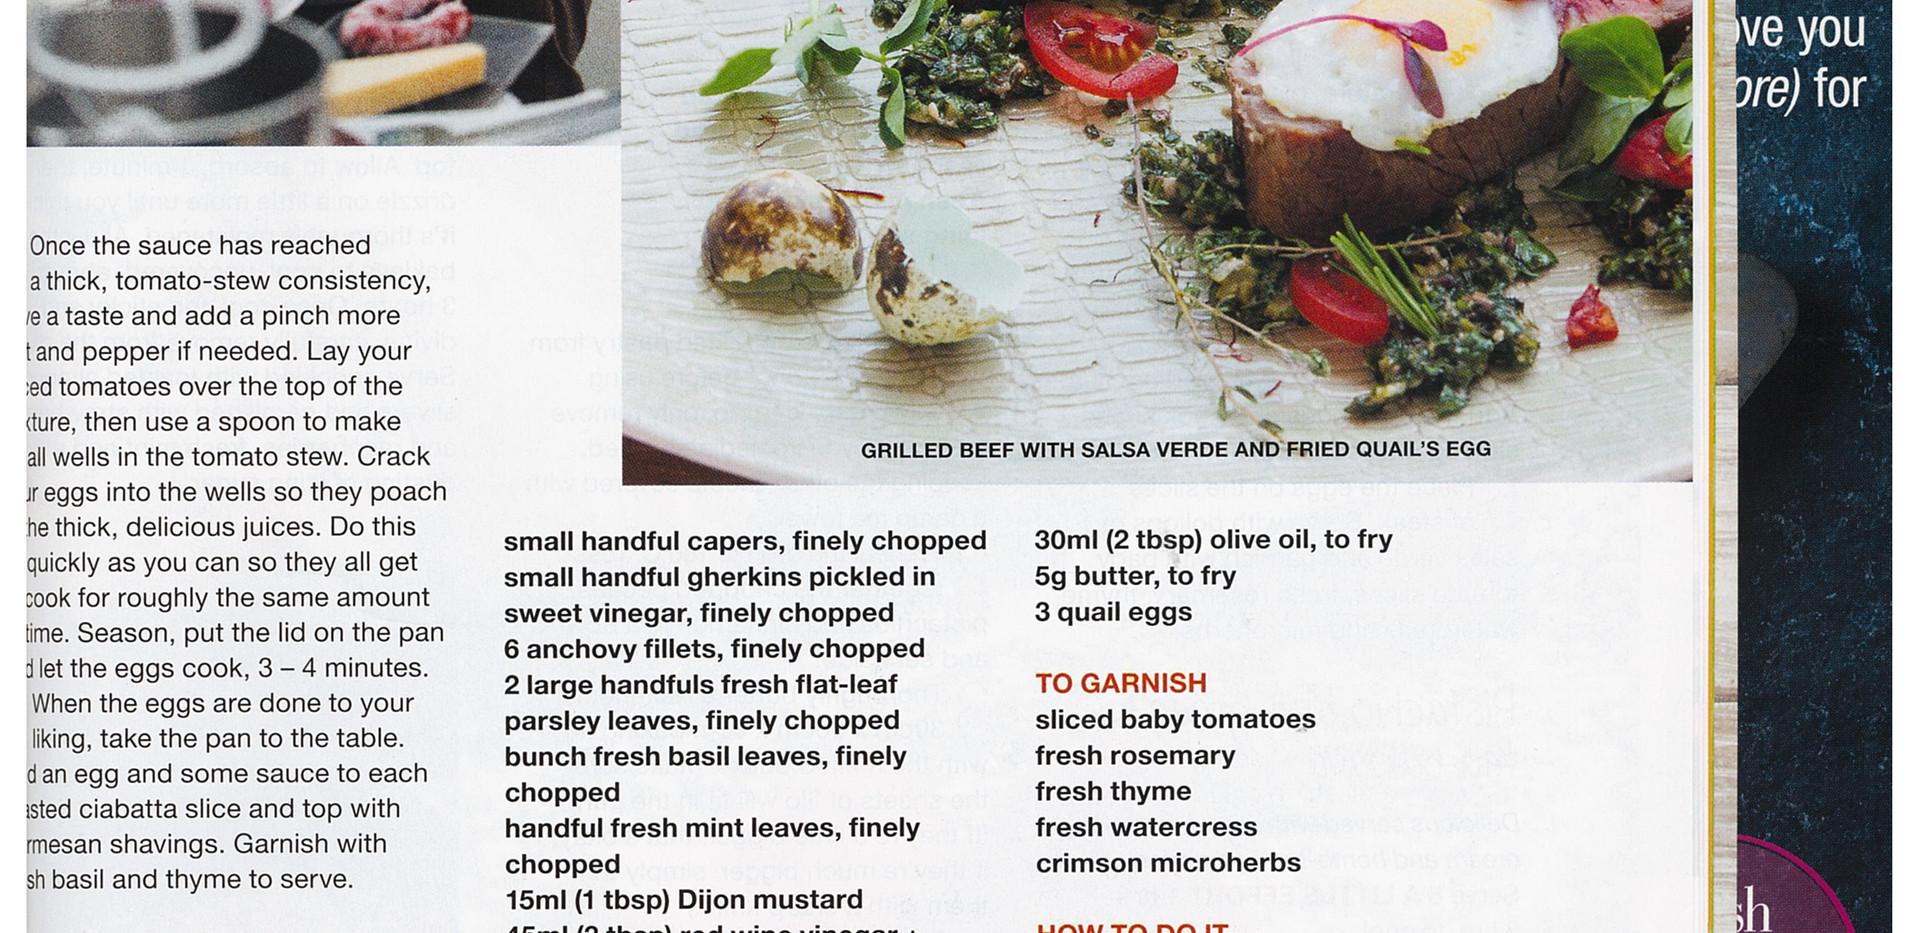 FOOD & HOME APRIL PAGE 117.jpg